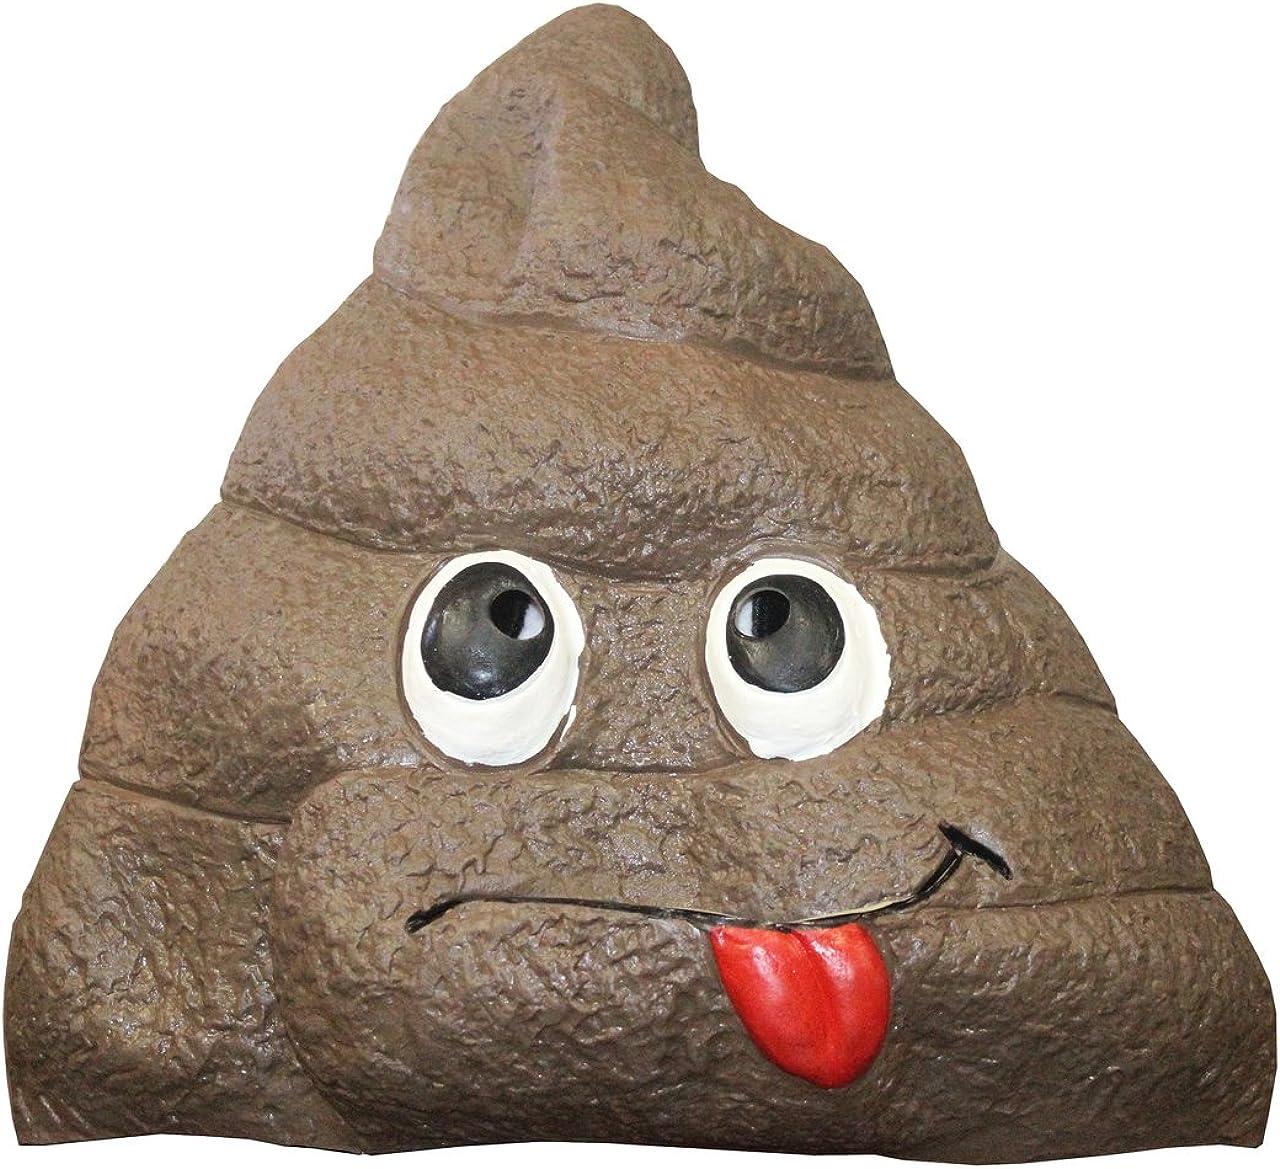 Doo Doo Giant Poop Fake Doody Head Latex